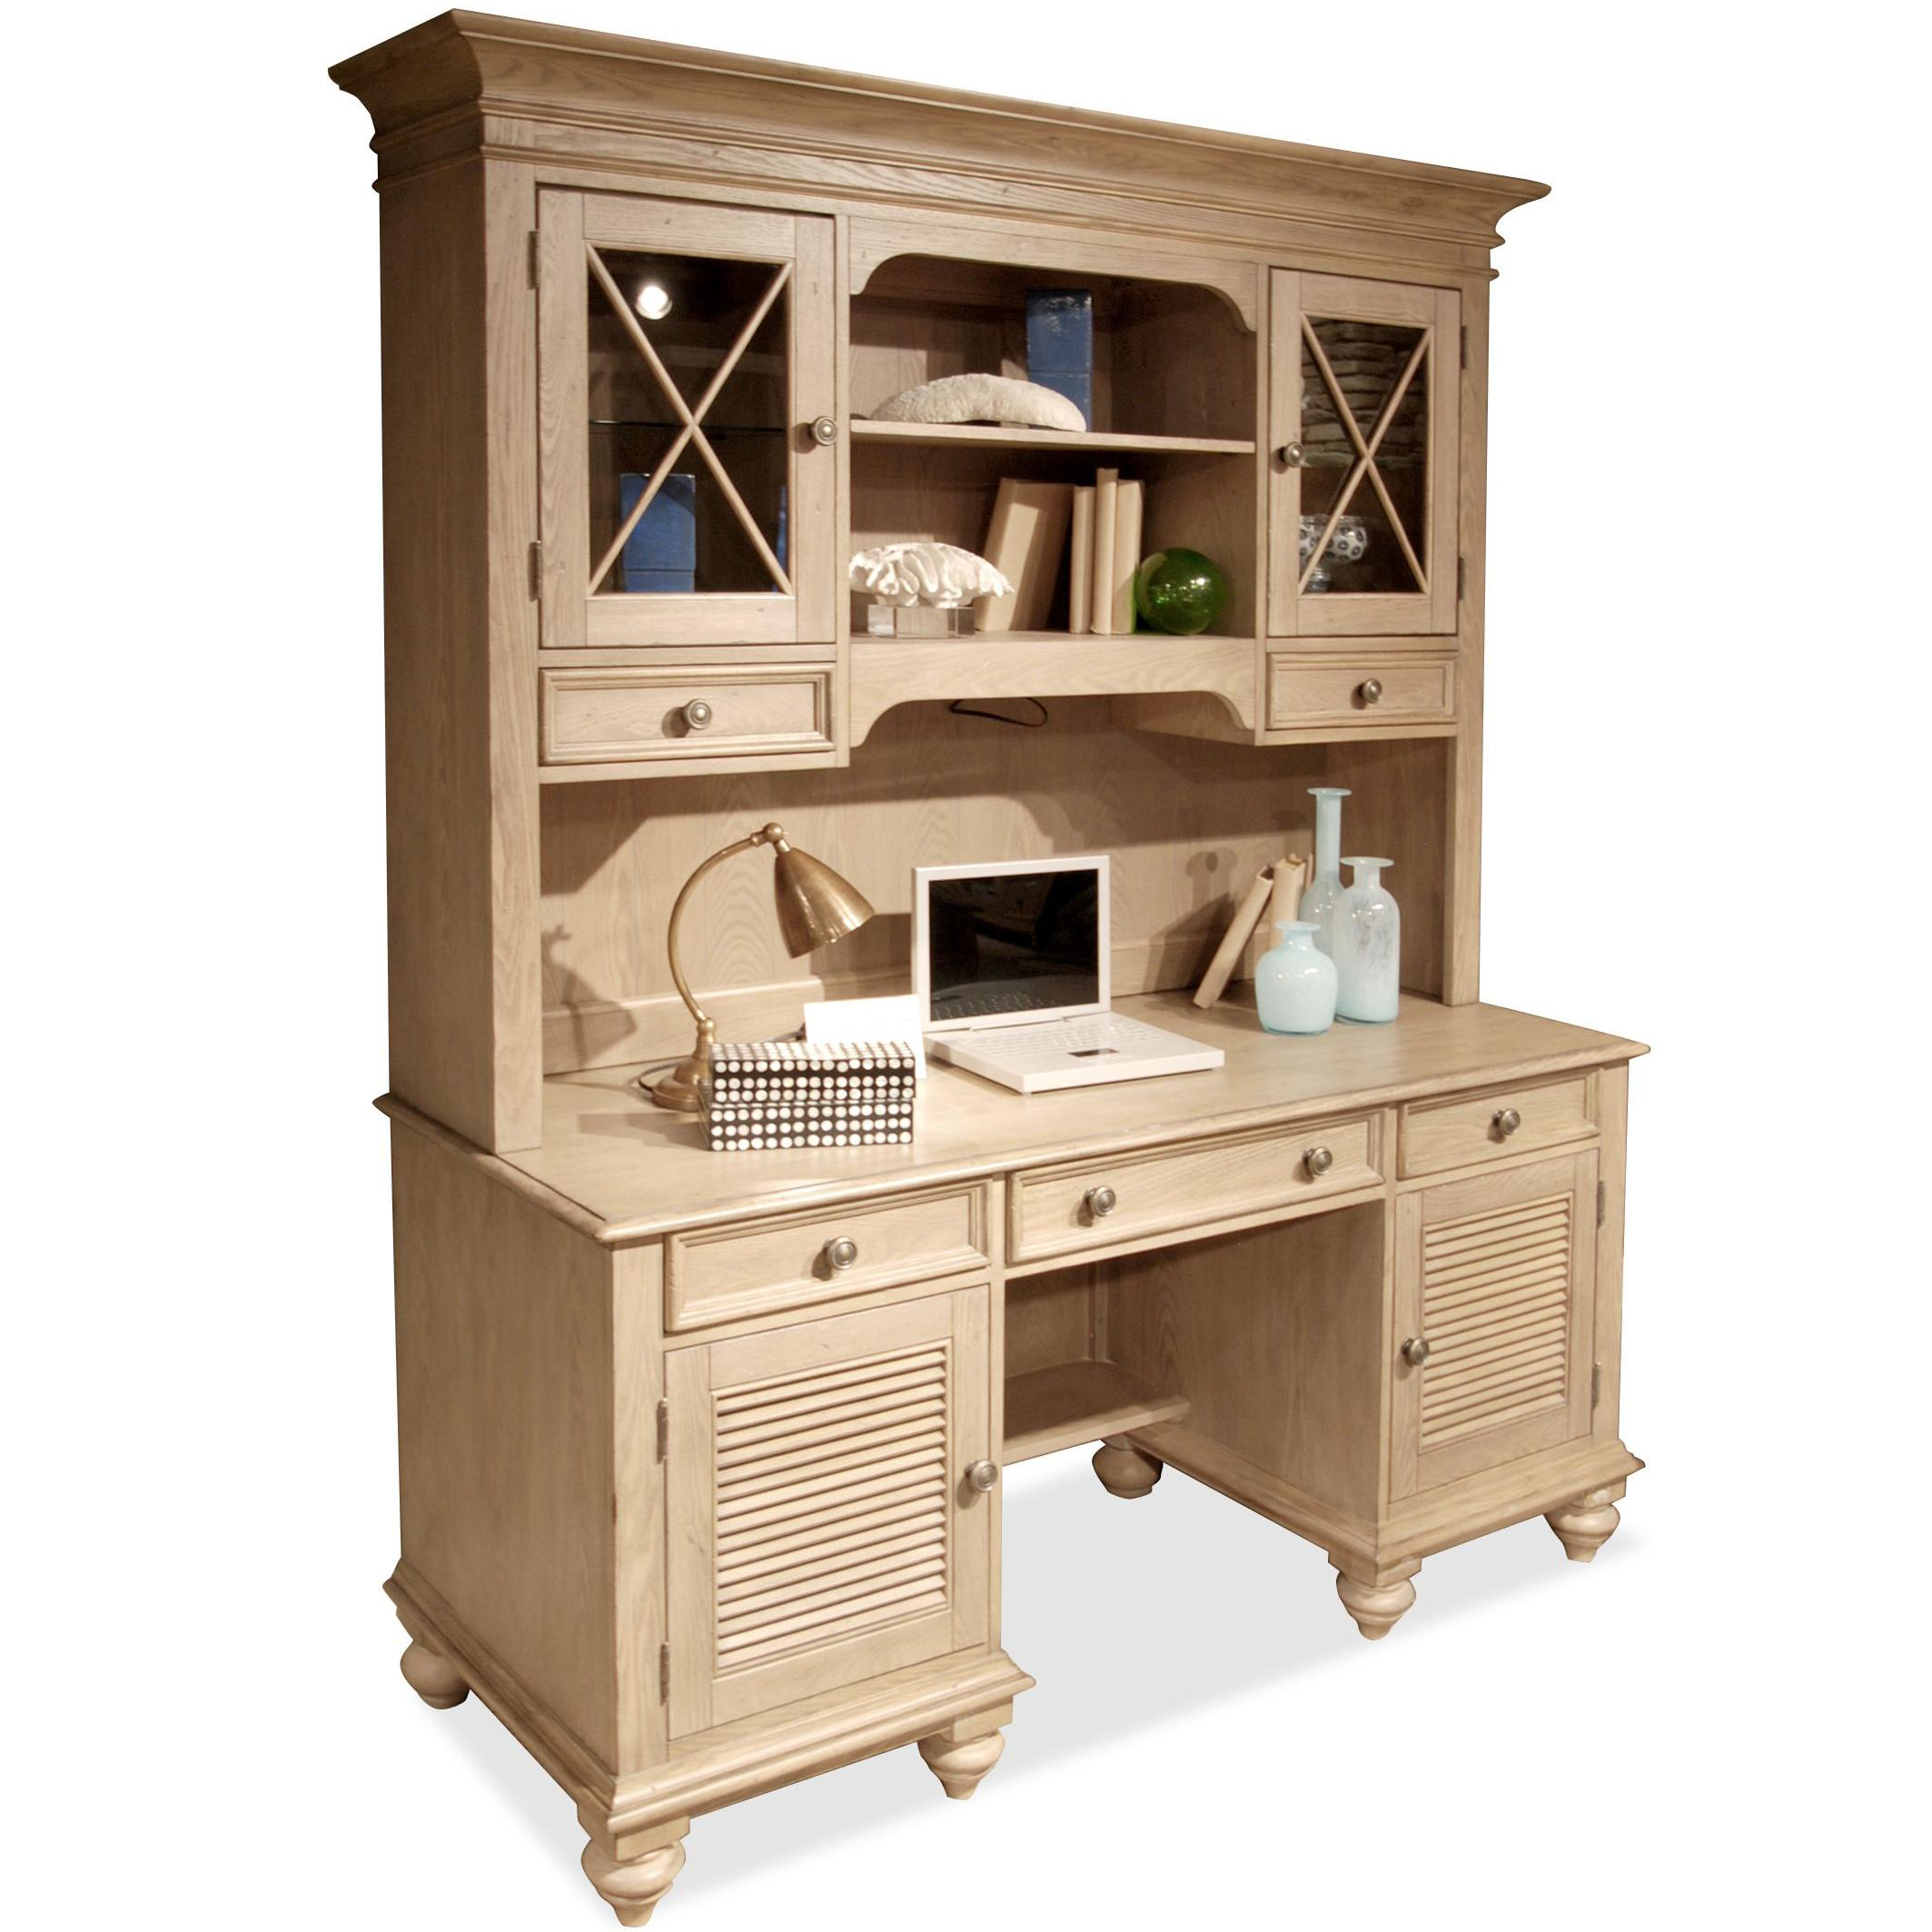 Riverside Furniture Coventry Shutter Door Credenza & Hutch - Item Number: 32433+36